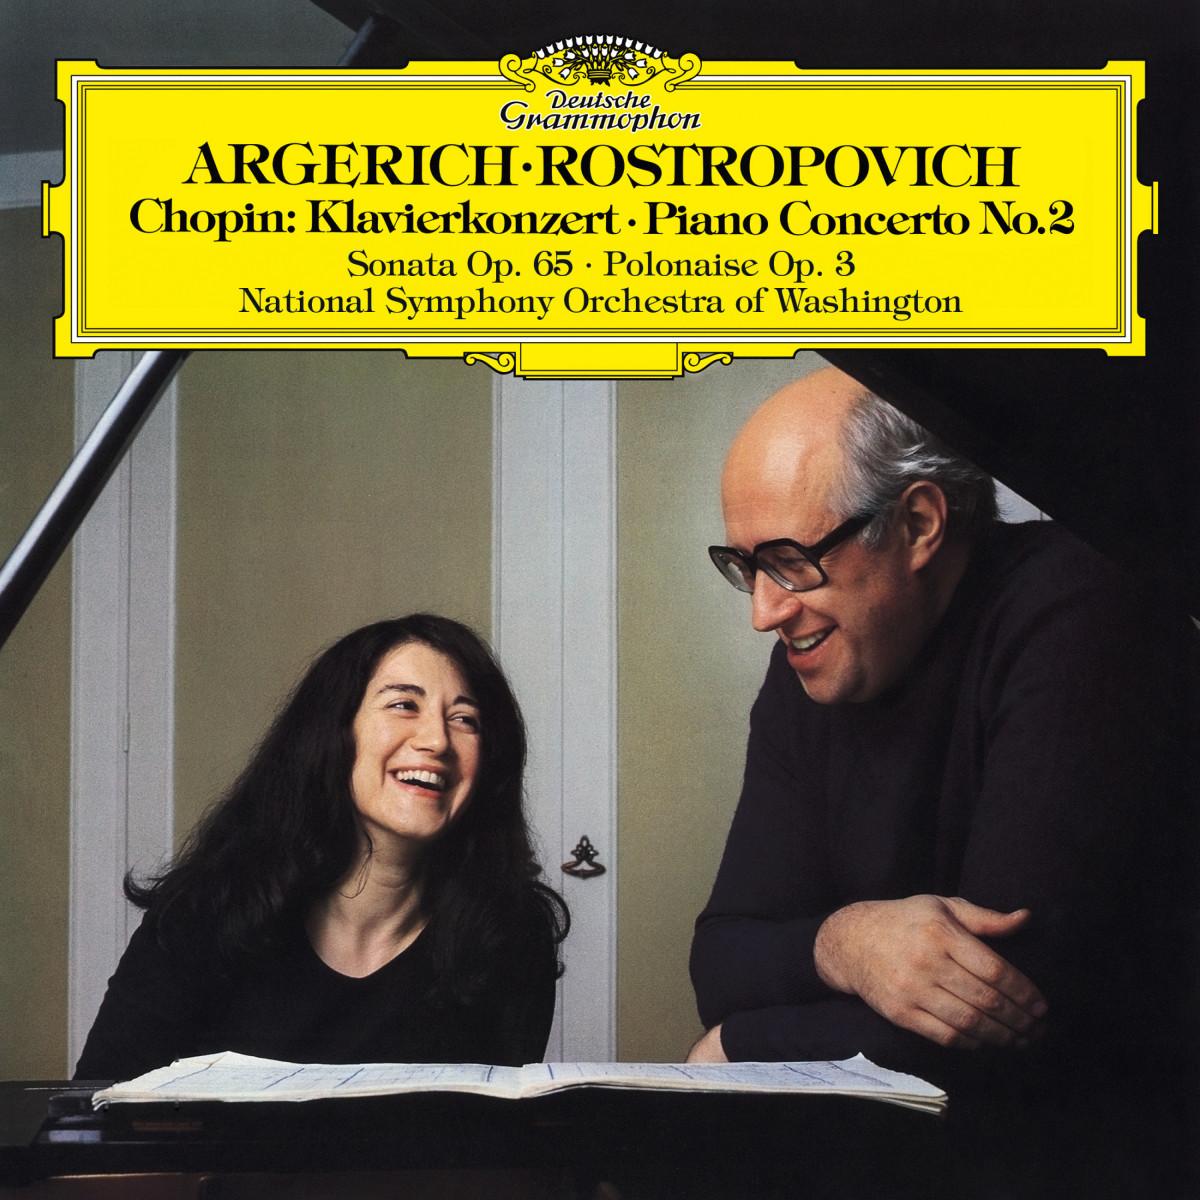 Martha Argerich - Chopin: Piano Concerto No. 2, Introduction & Polonaise brillante, Op. 3 & Cello Sonata in G Minor, Op. 65 eAlbum Cover